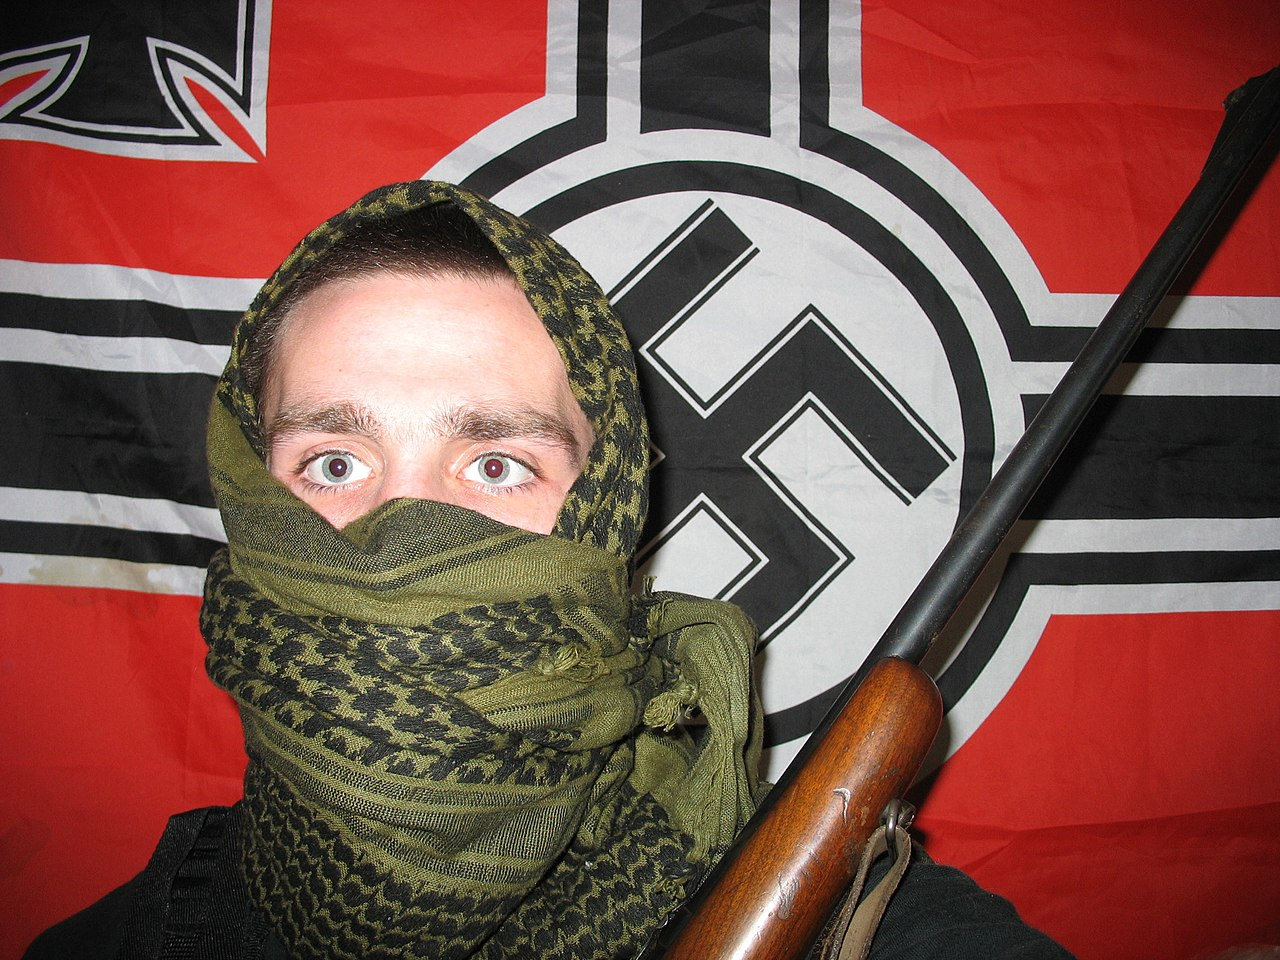 American Nazi Party is a neoNazi